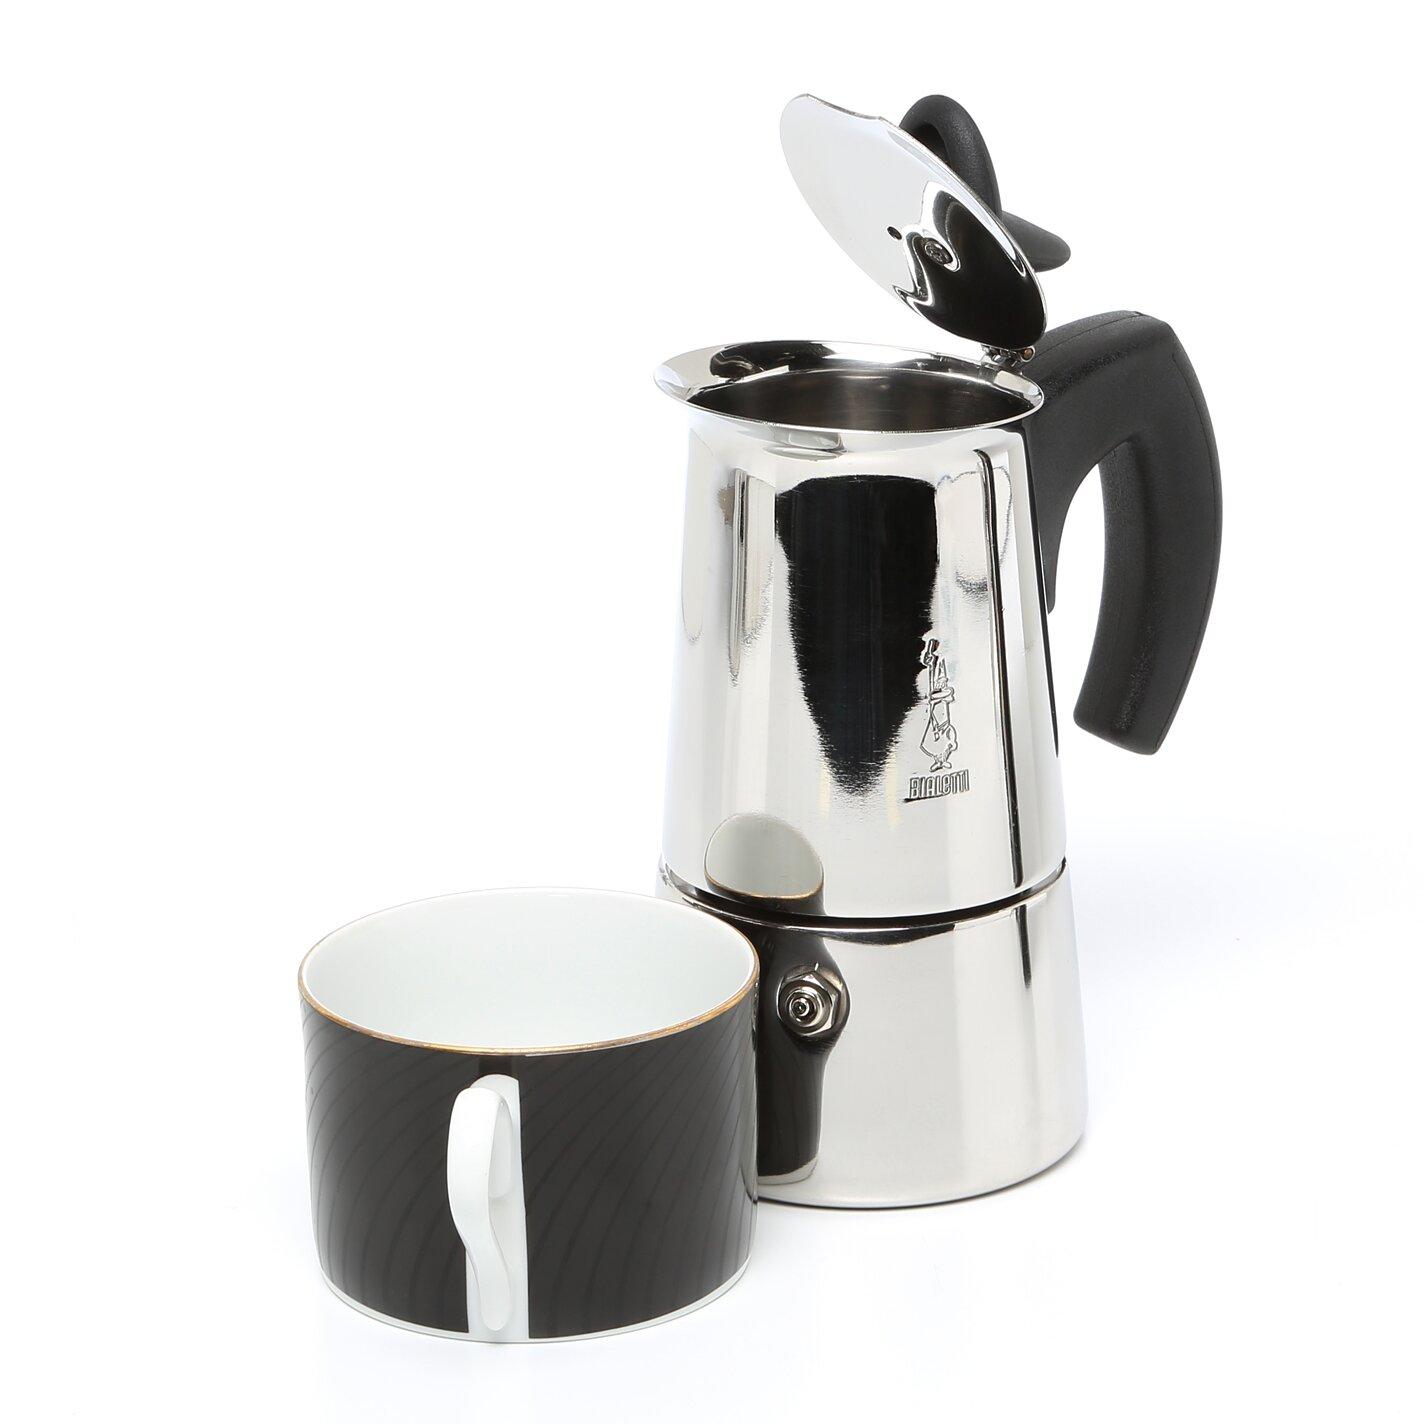 Italian Coffee Maker Reviews : Stovetop Espresso Maker Review. Coffee Archives. Italian Coffee Maker Parts. Saeco Xsmall Auto ...